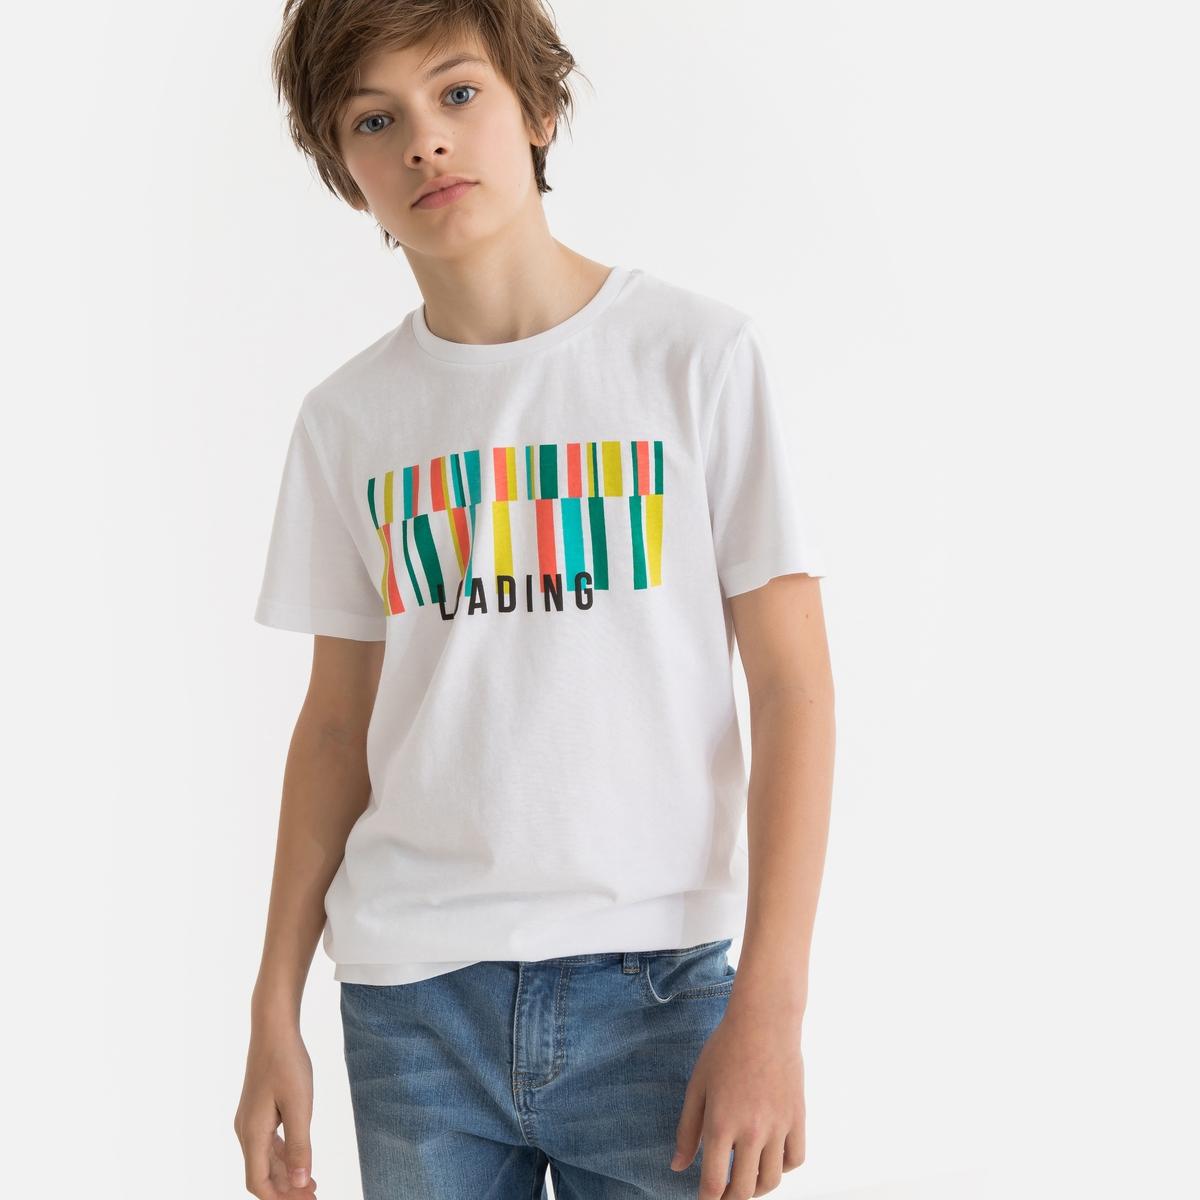 Футболка La Redoute С круглым вырезом и рисунком спереди 10 лет - 138 см белый футболка la redoute с вышитым рисунком спереди 10 лет 138 см серый